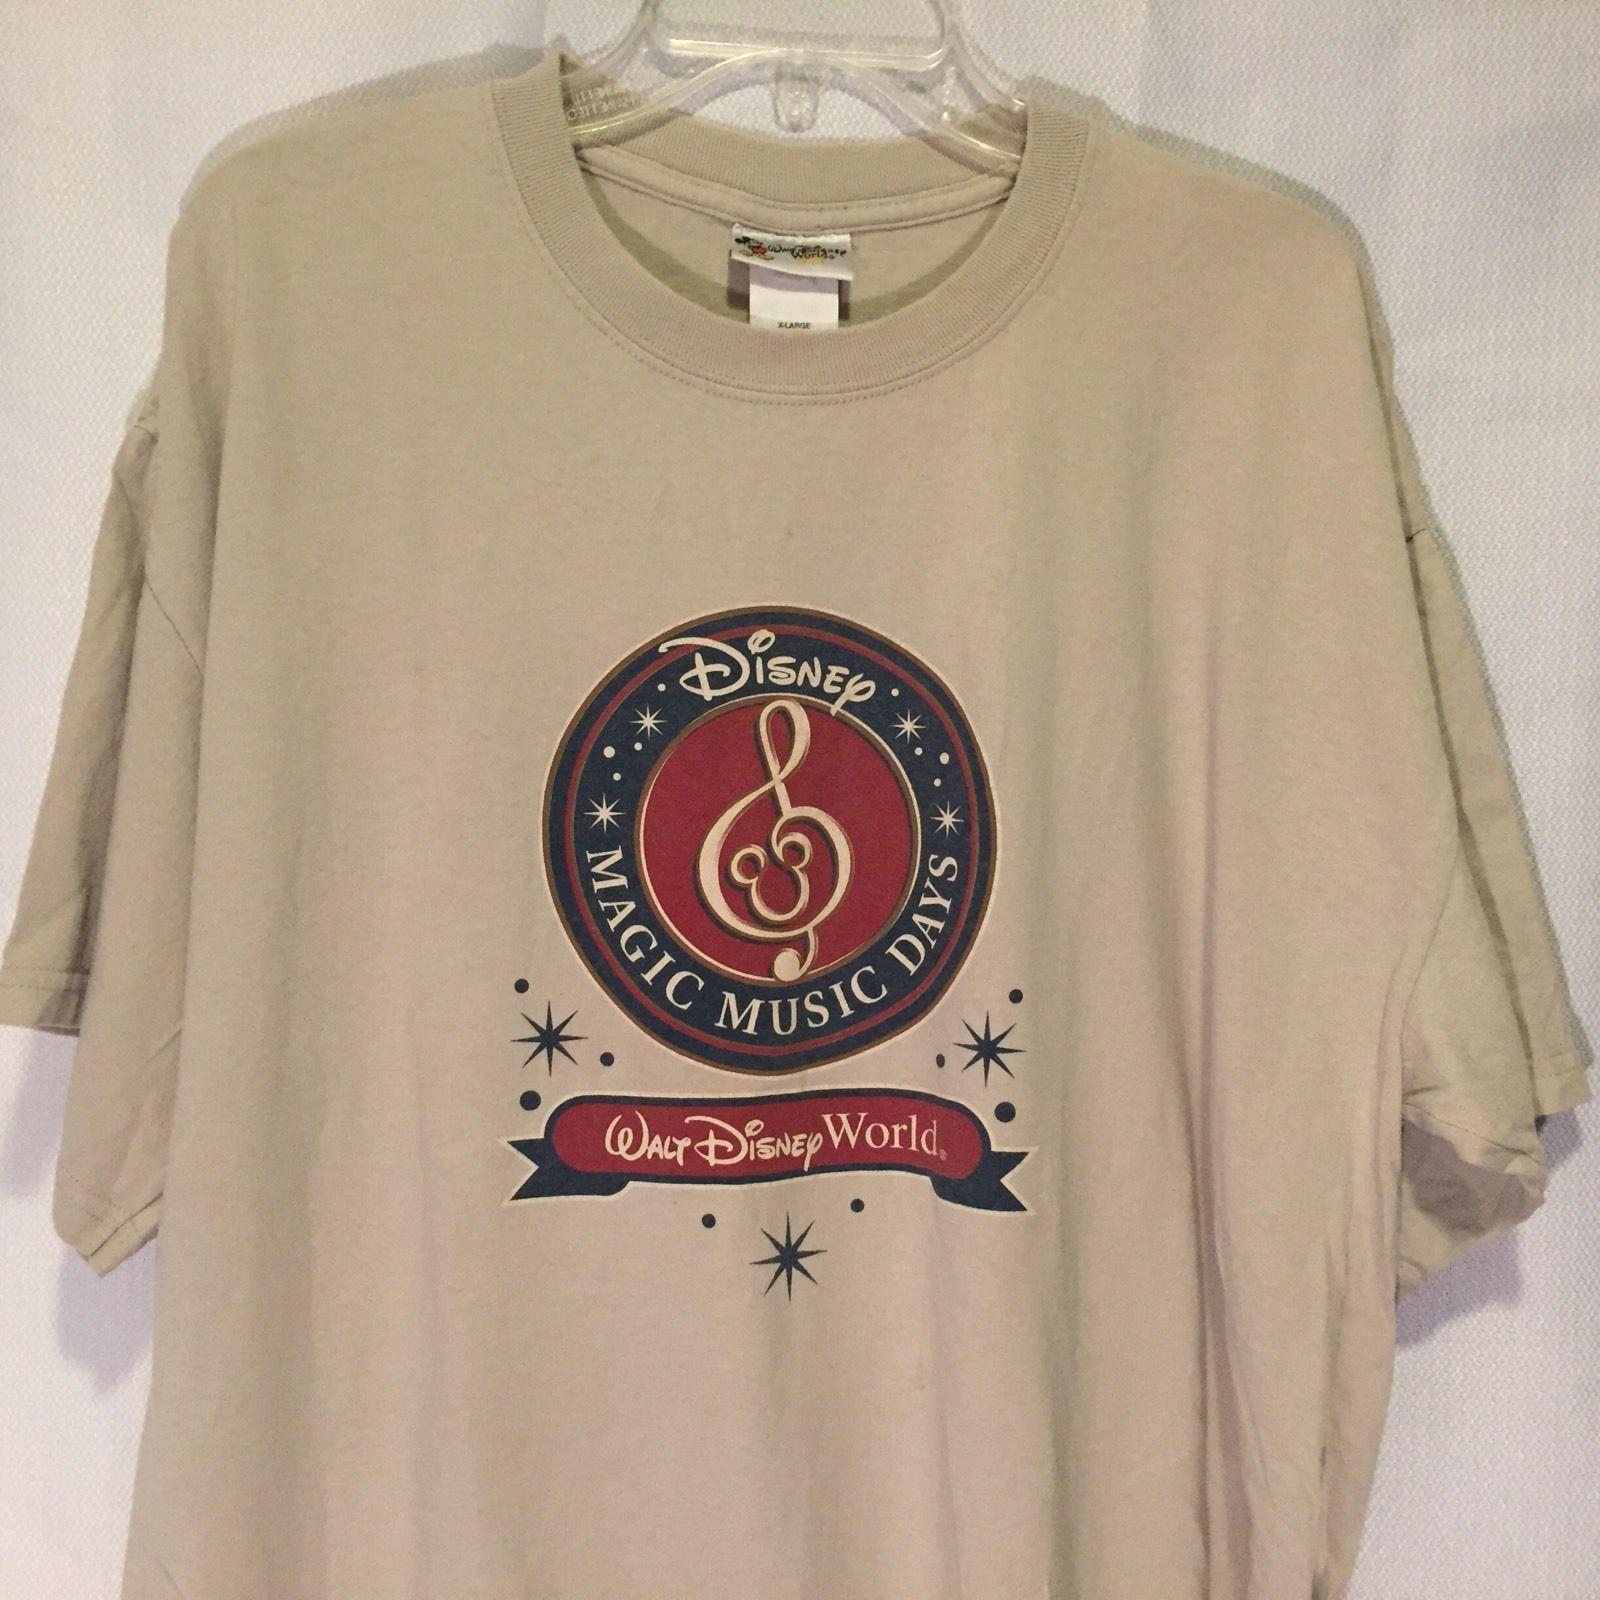 Walt Disney World Mickey Mouse Magic Music Days T-Shirt XL Brown Cotton X Large